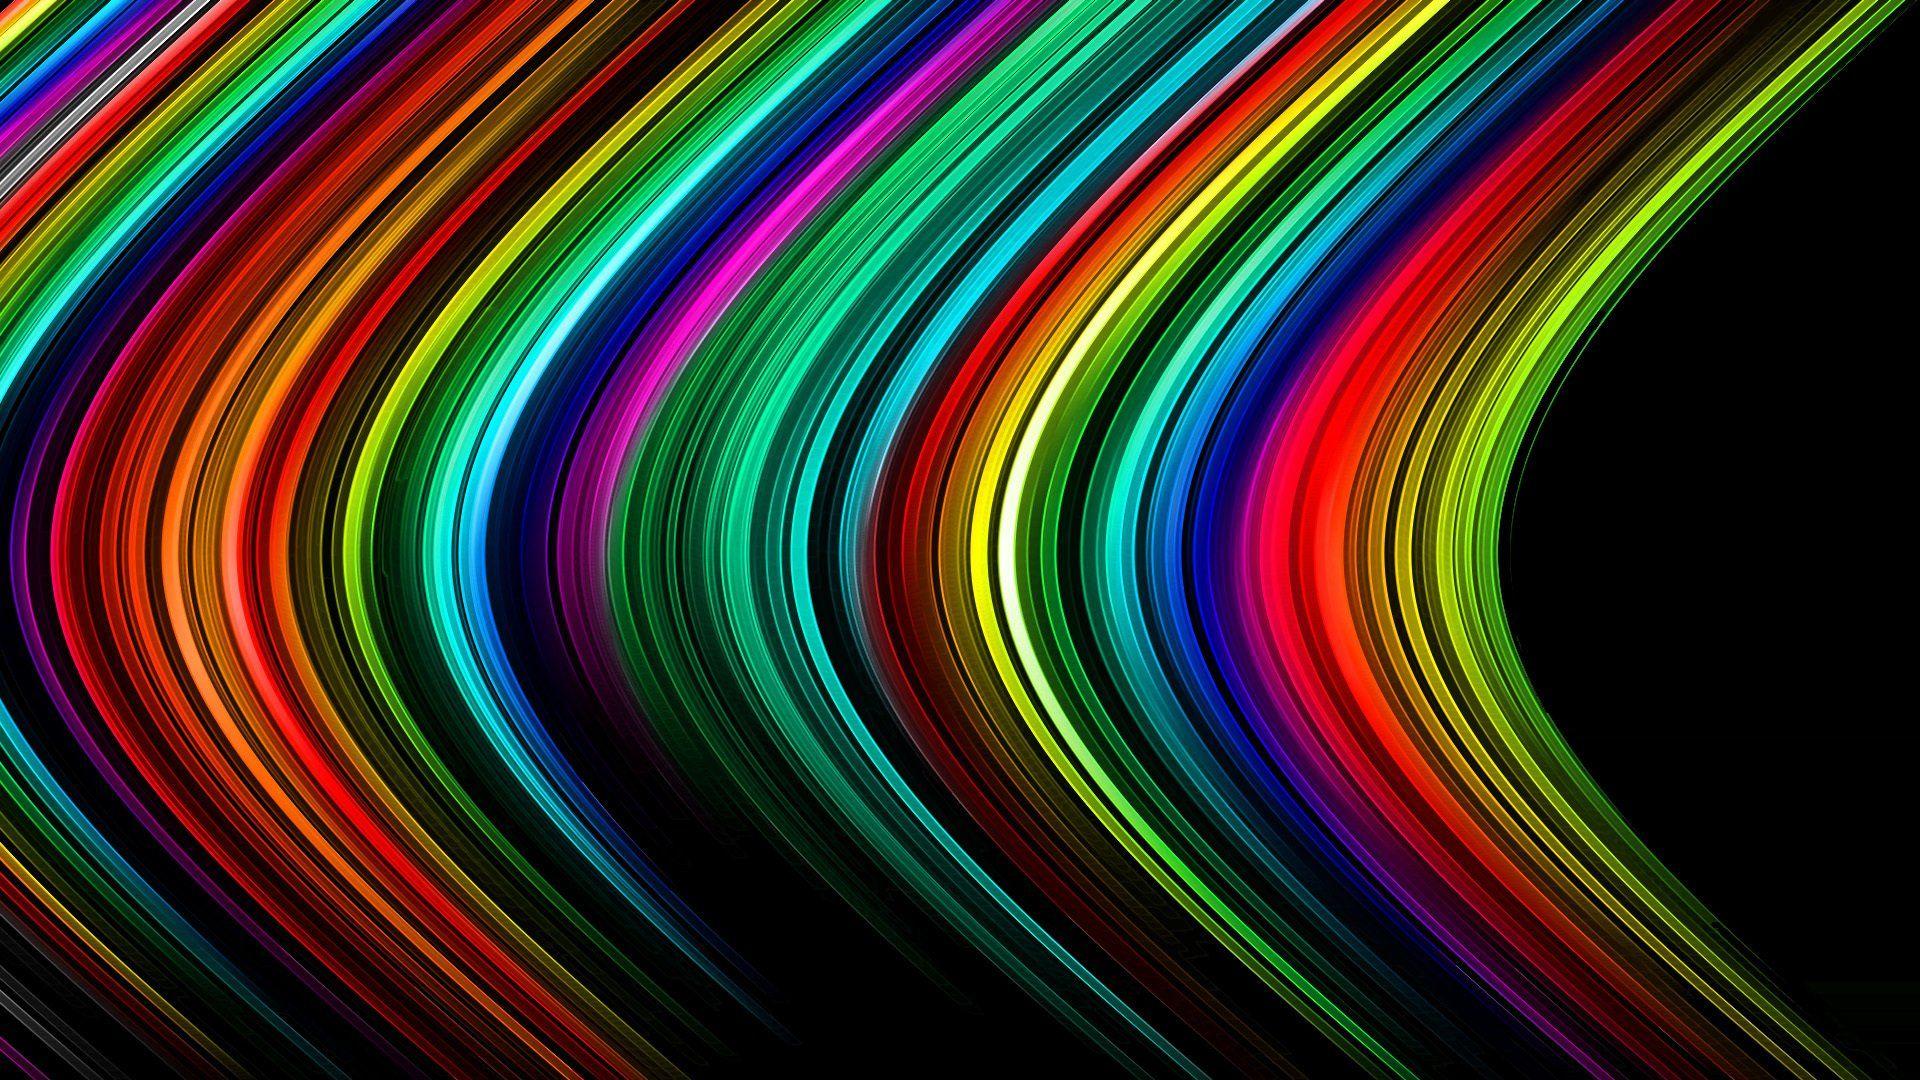 Rainbow Background Wallpaper